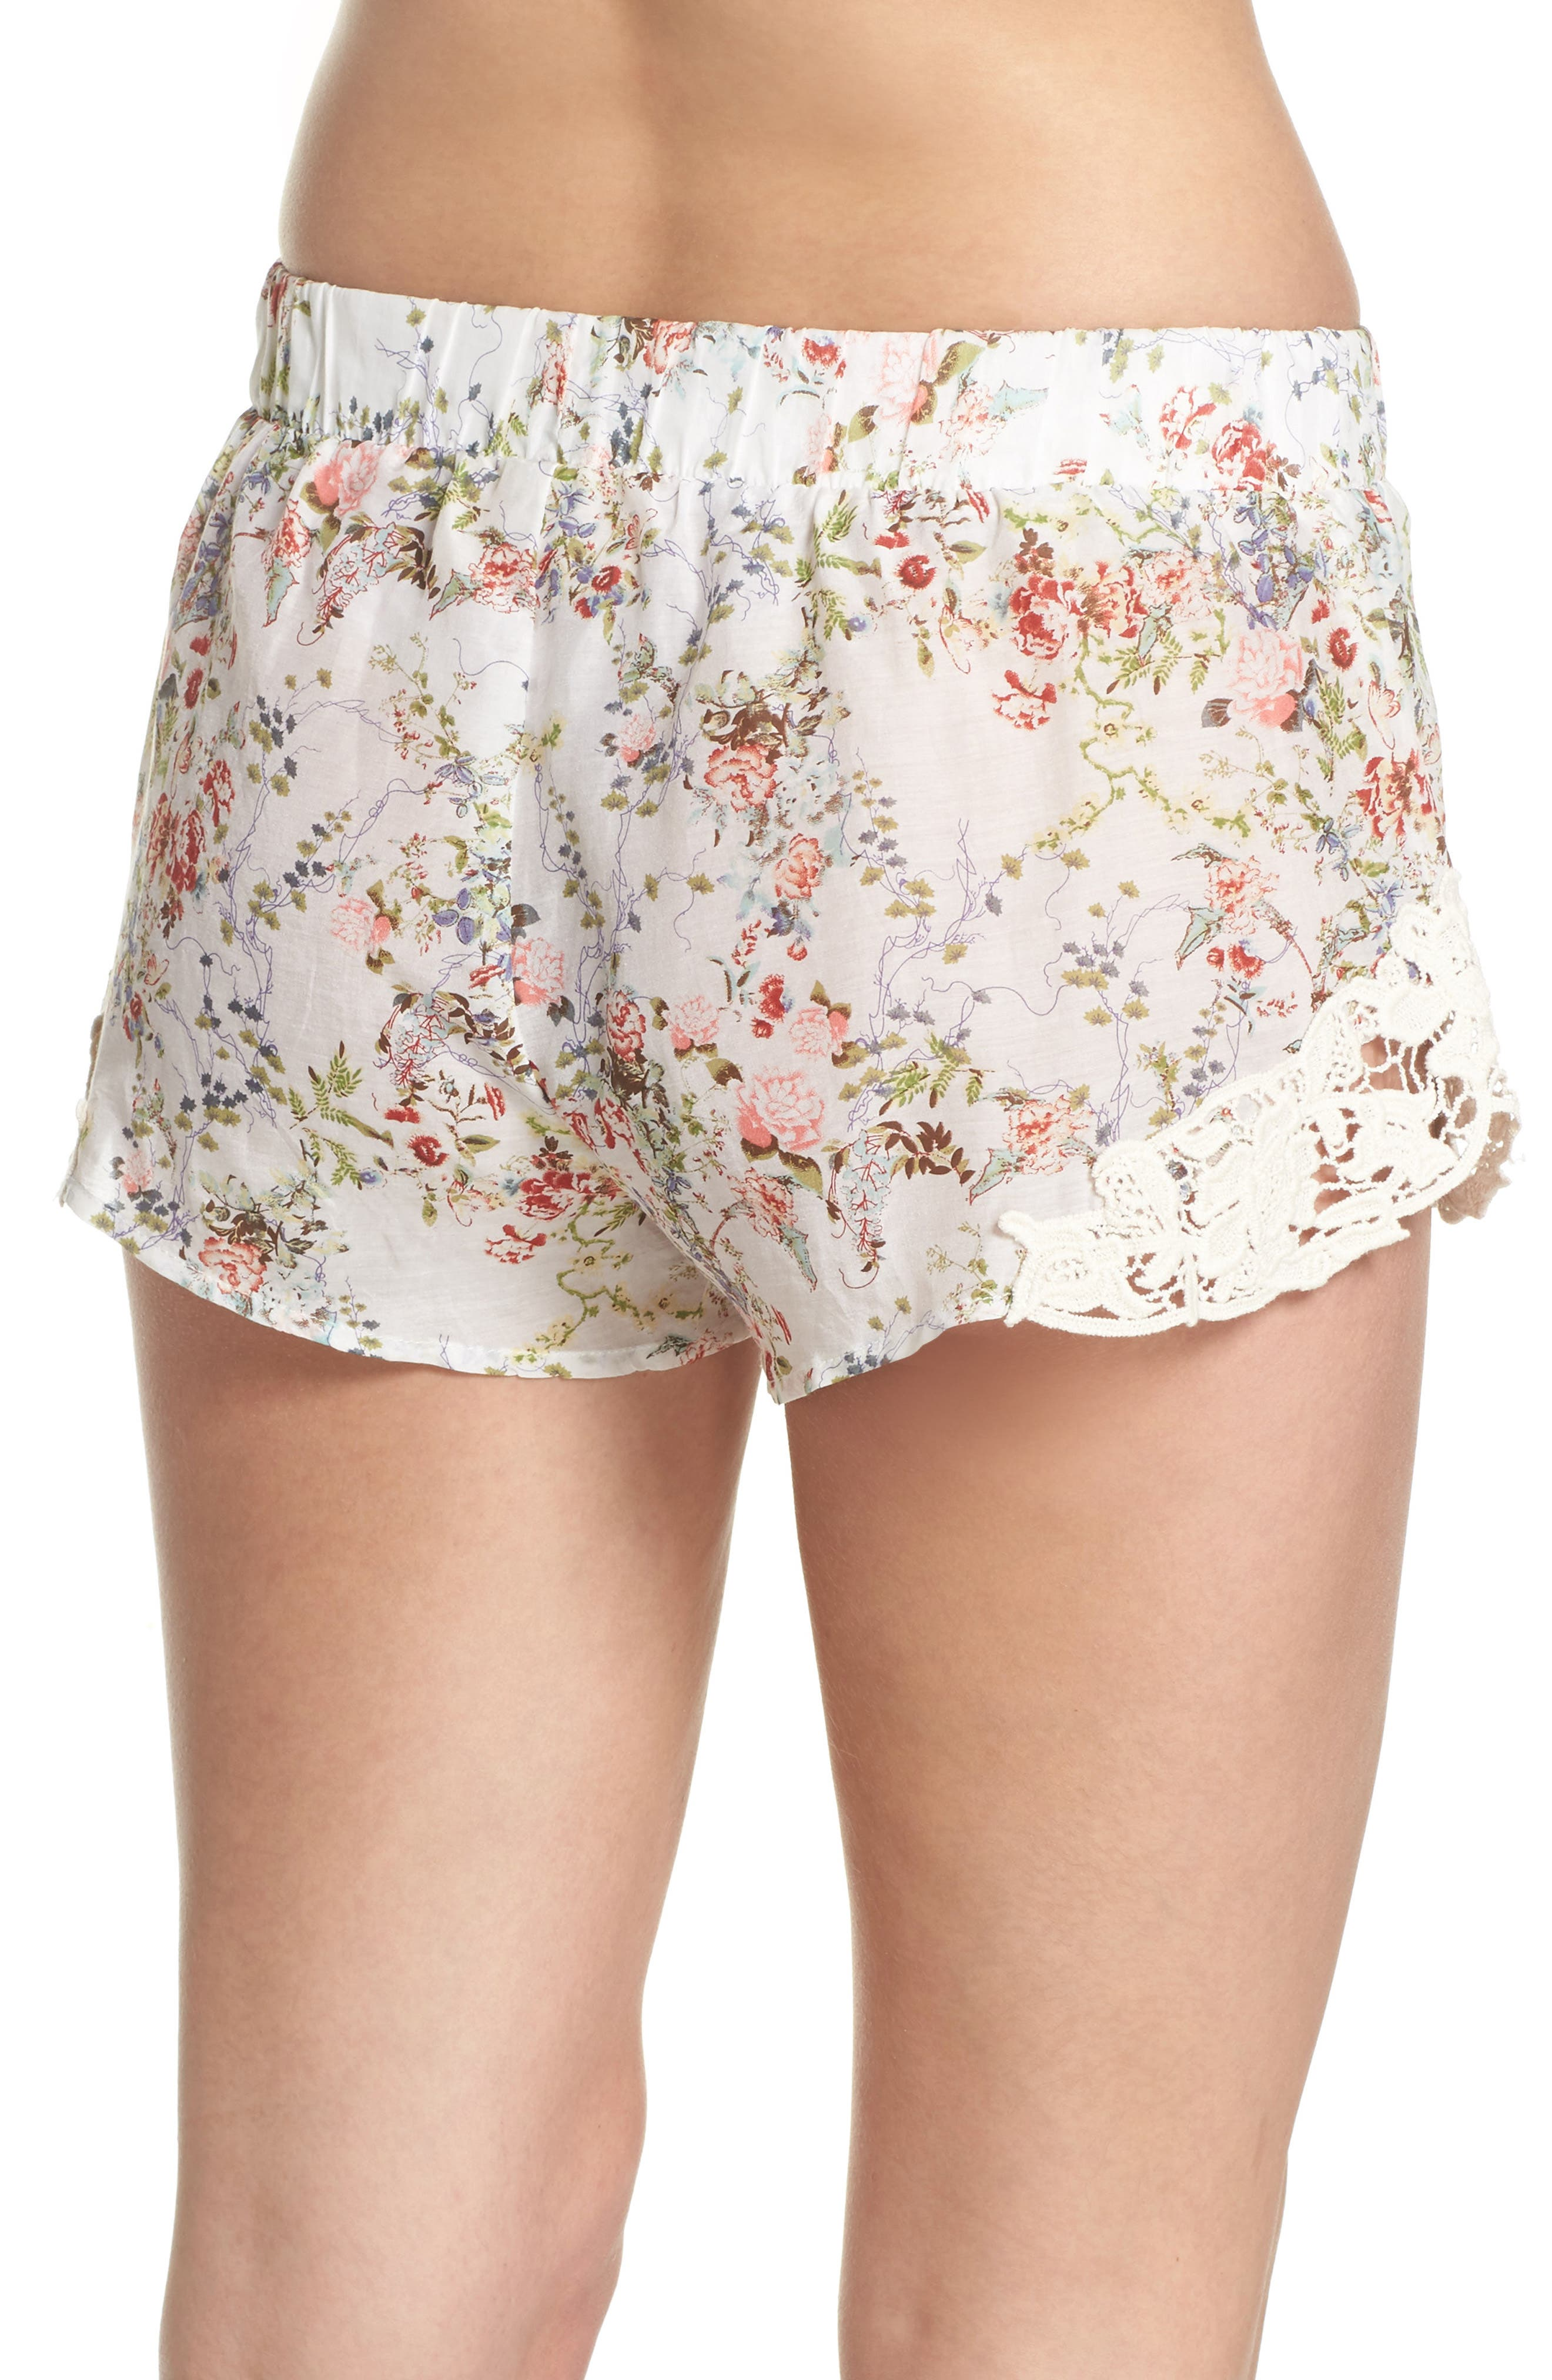 Yolly Floral Pajama Shorts,                             Alternate thumbnail 2, color,                             IVORY FLORAL